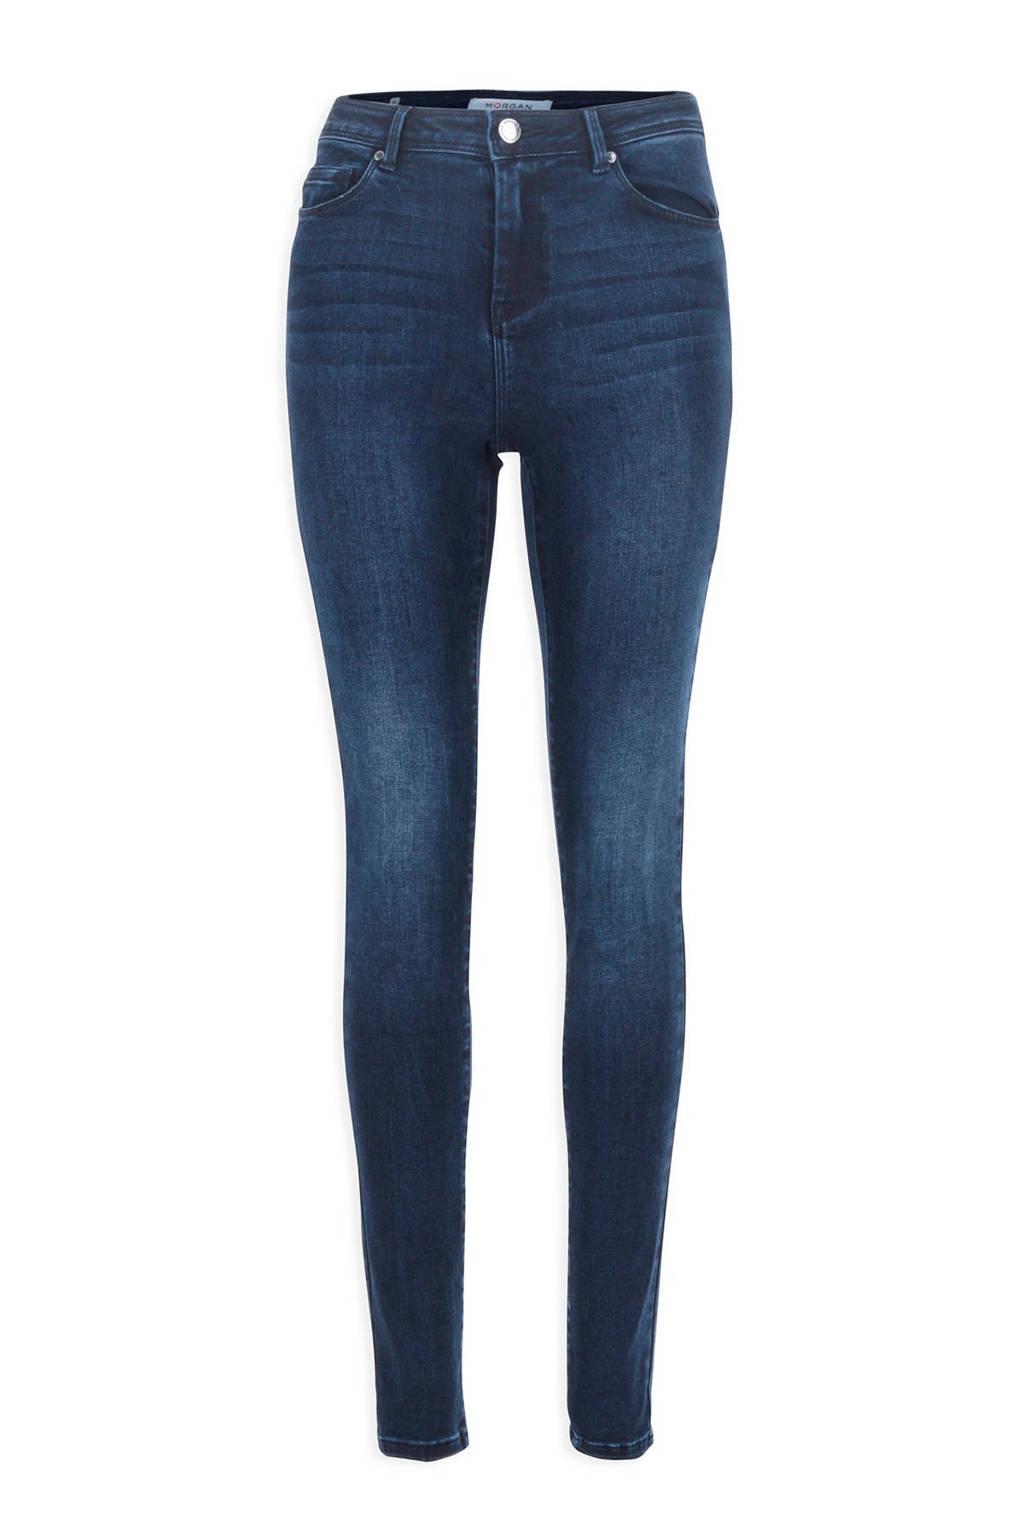 Morgan cropped high waist skinny jeans, Dark denim